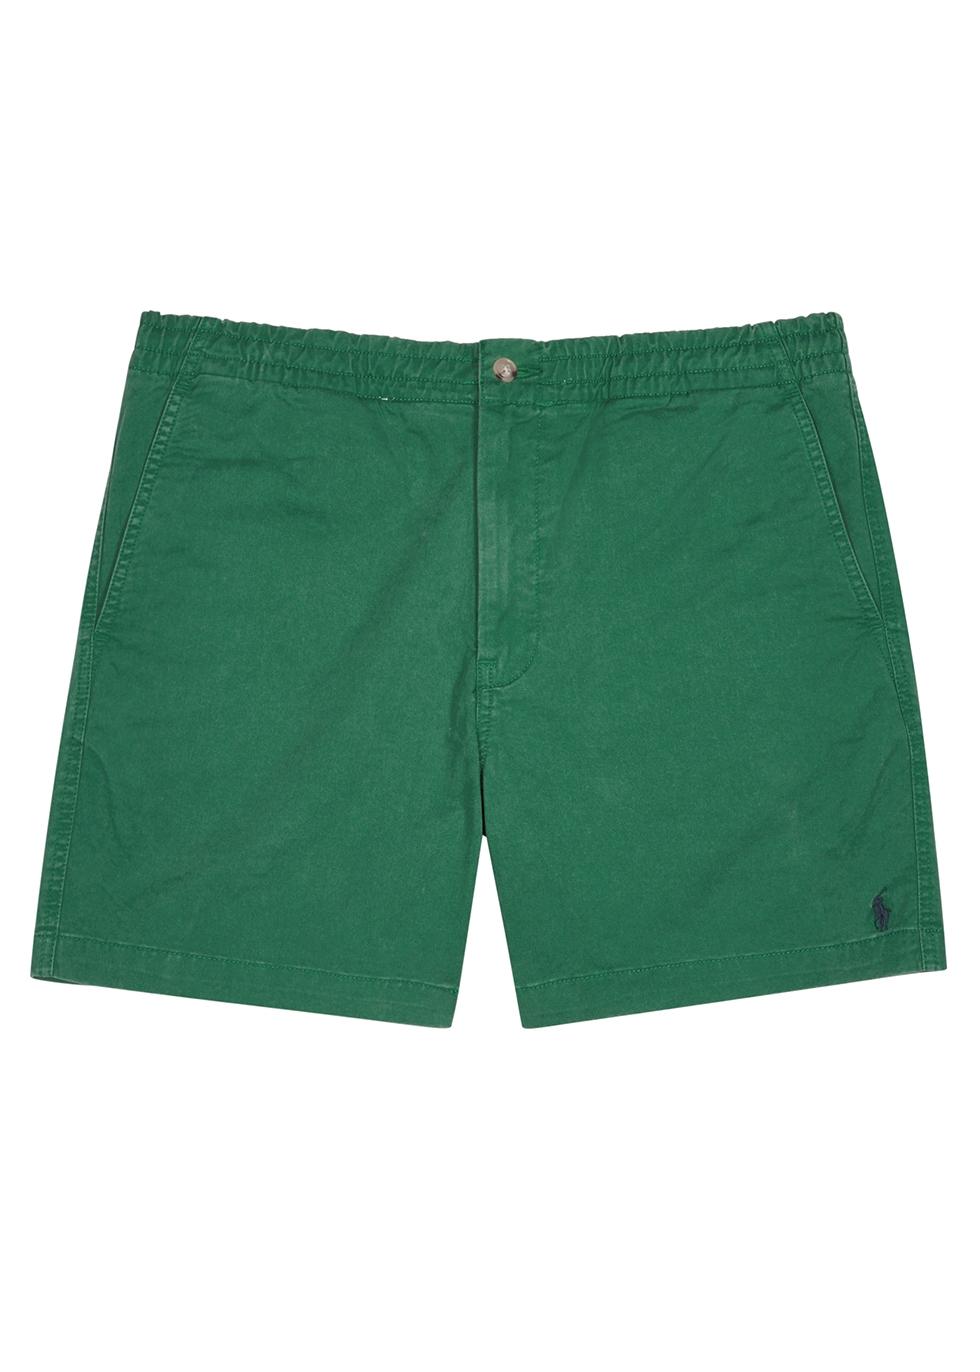 Green stretch-cotton shorts - Polo Ralph Lauren